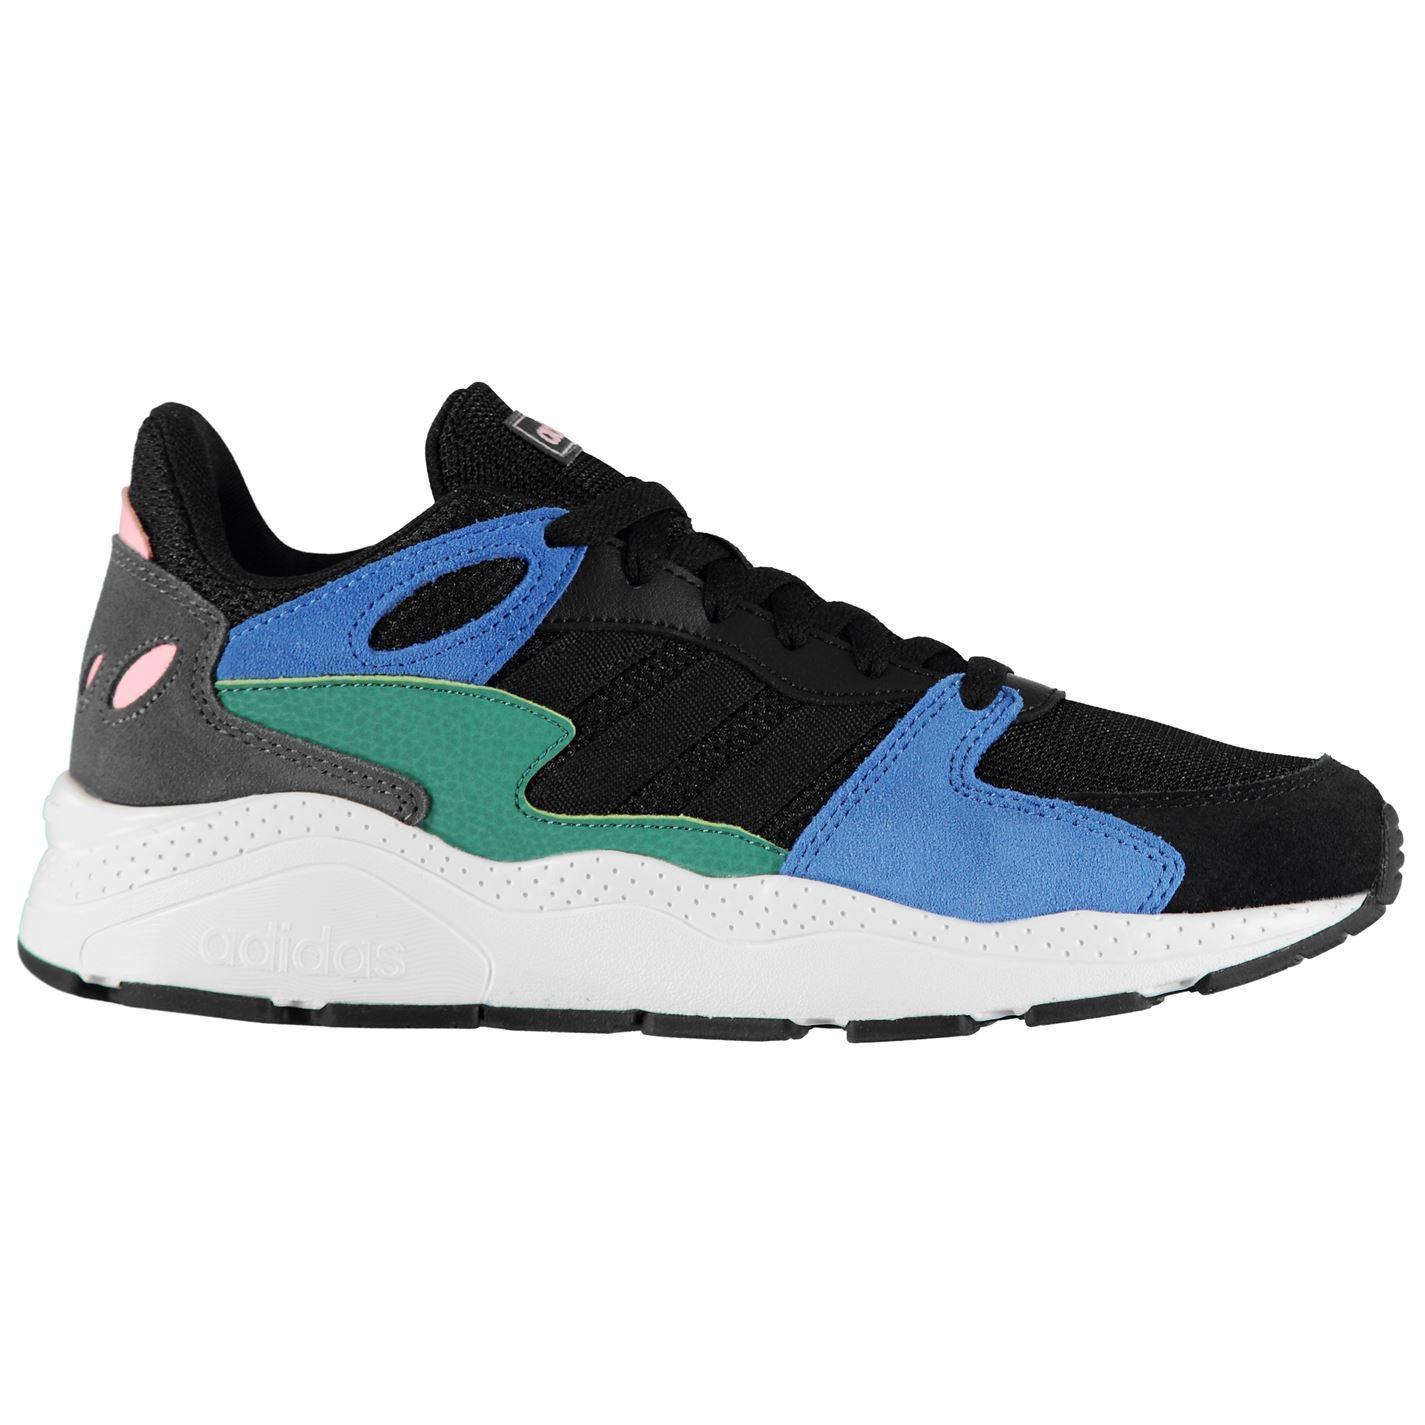 Adidas-Crazychaos-Baskets-Homme-Chaussures-De-Loisirs-Chaussures-Baskets miniature 17